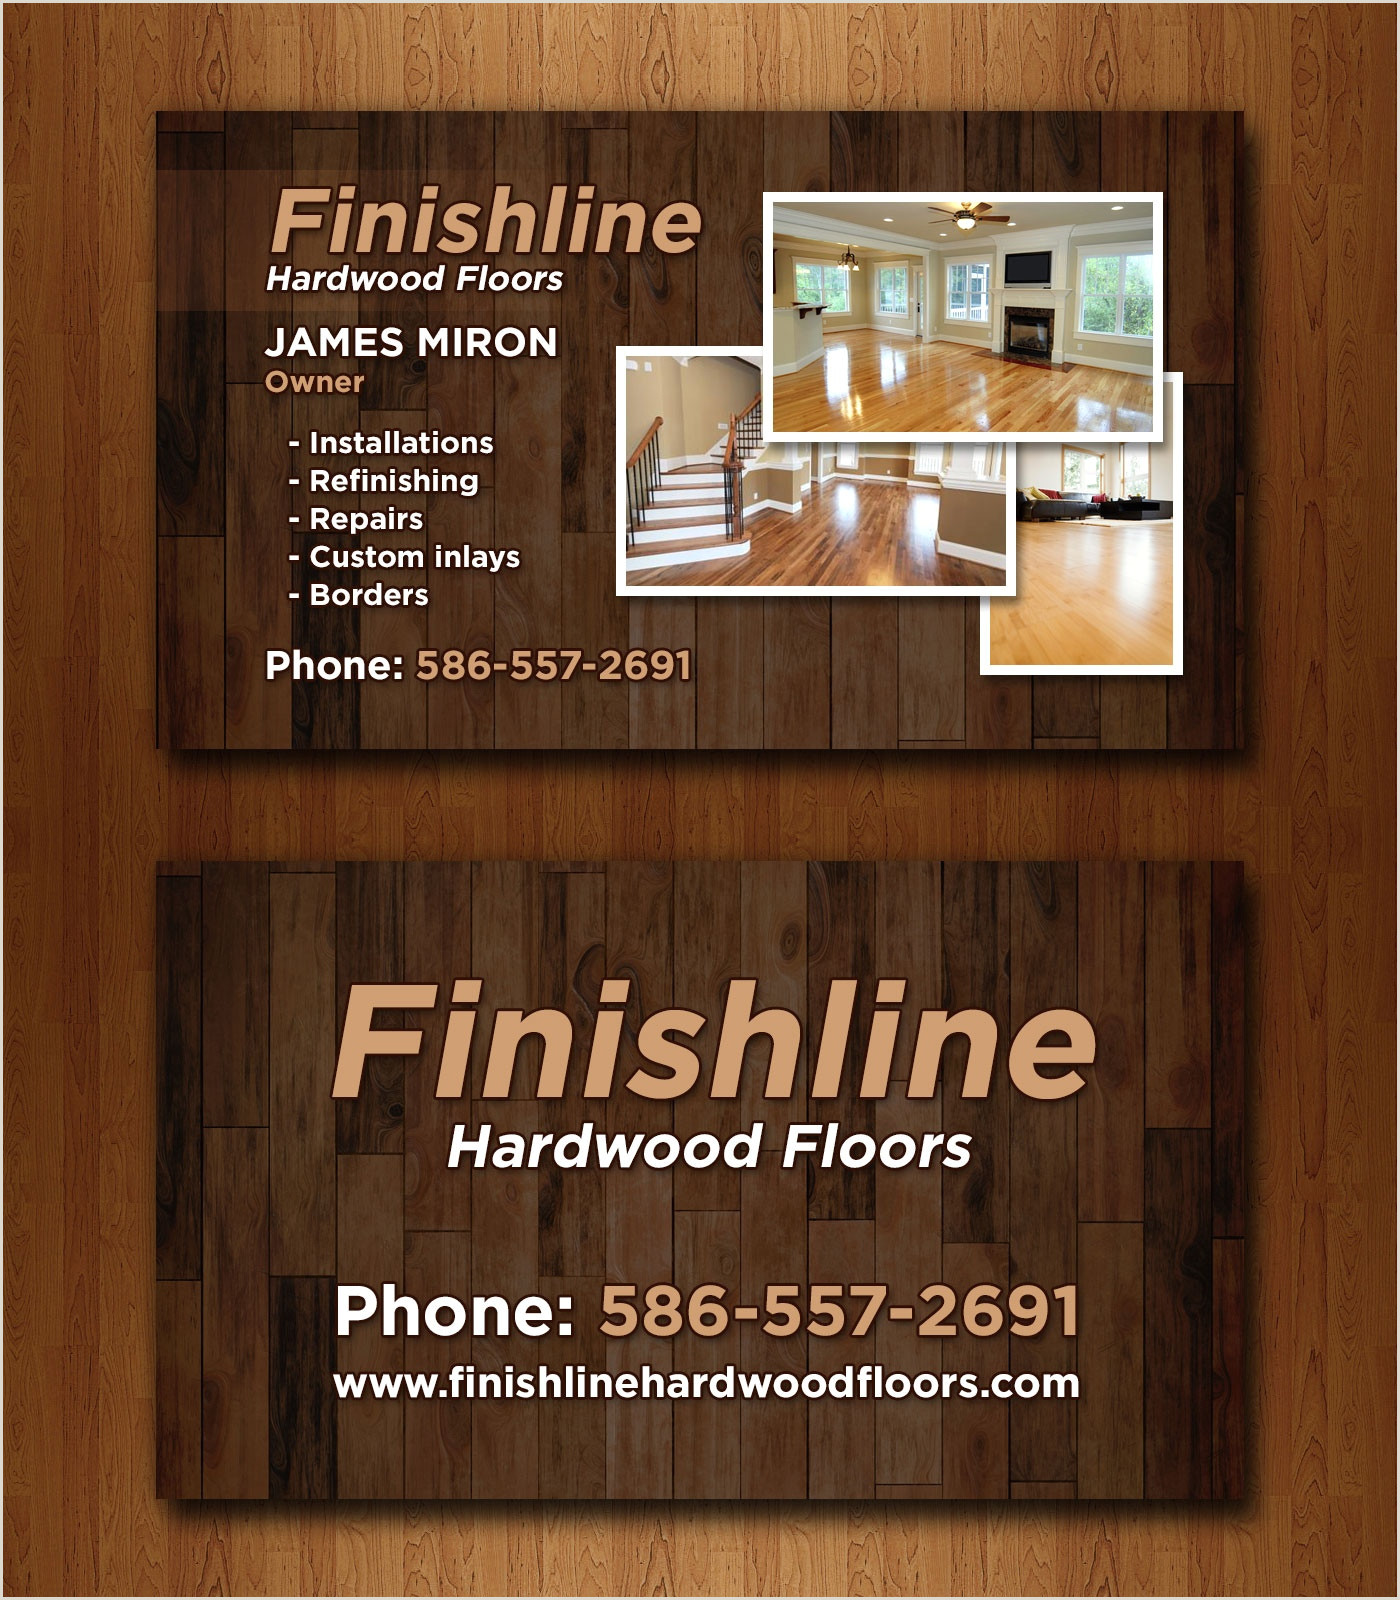 Personal Business Cards Samples 14 Popular Hardwood Flooring Business Card Template